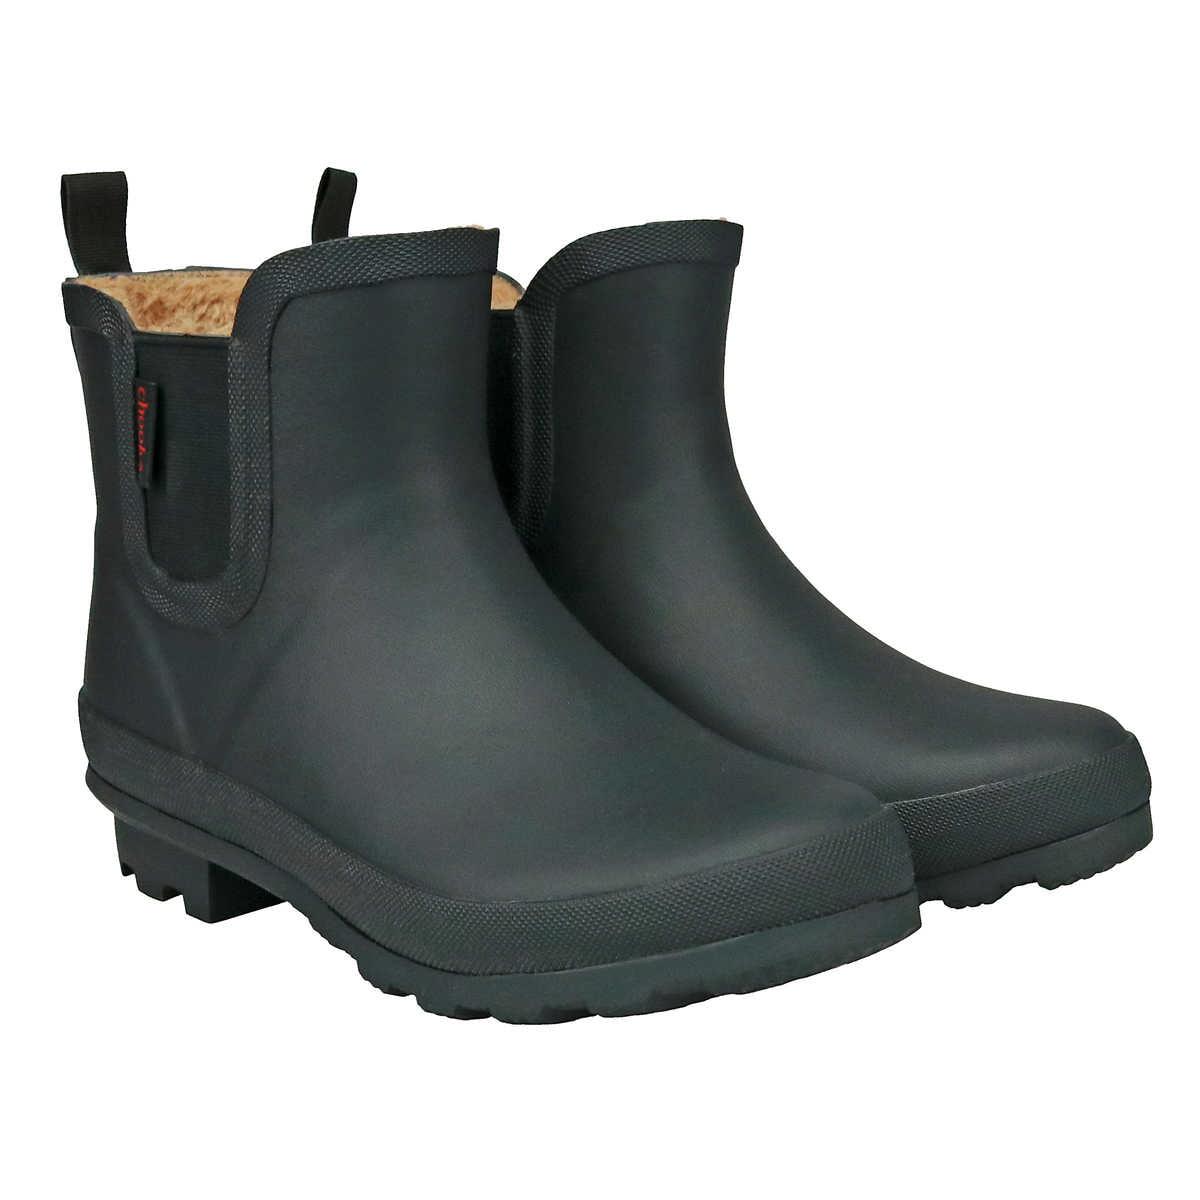 Chooka Chooka Women S Short Rain Boots Waterproof Ladies Anti Slip Rubber Black Ankle Plush Chelsea Booties 6 Walmart Com Walmart Com